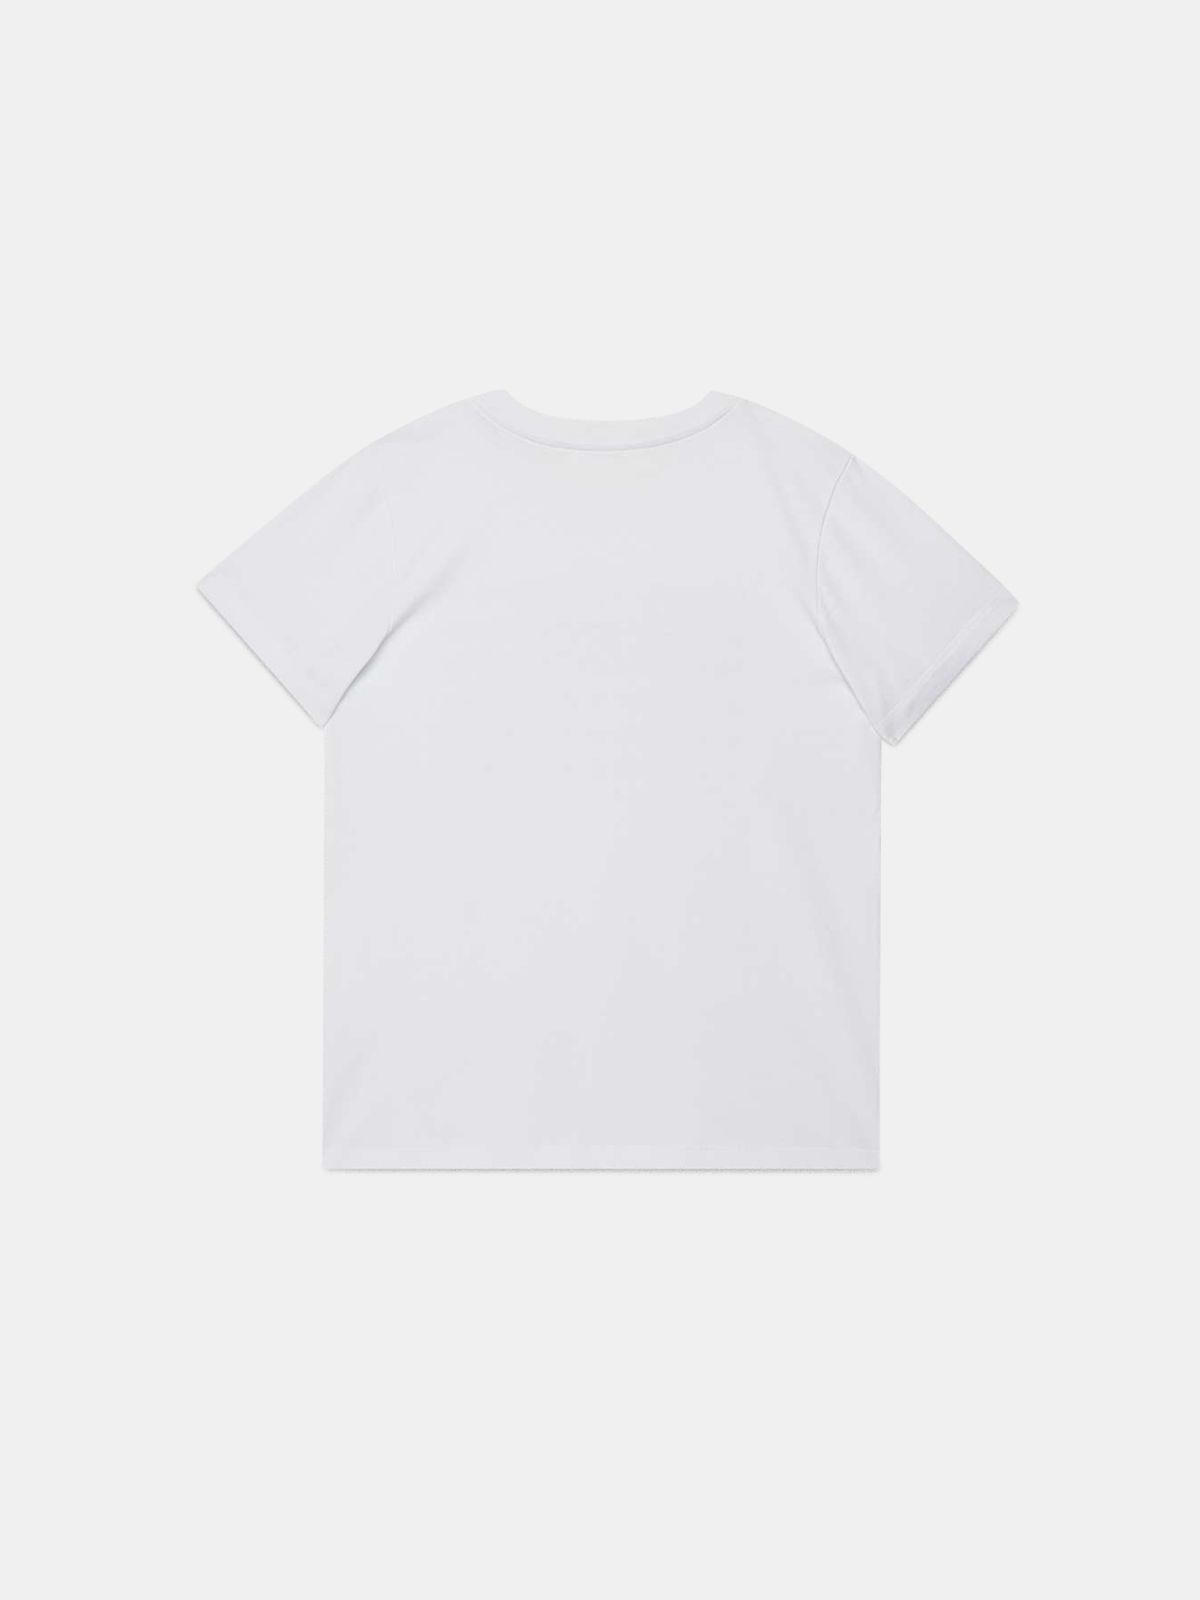 Golden Goose - T-shirt Venice bianca con stampa dorata flag in